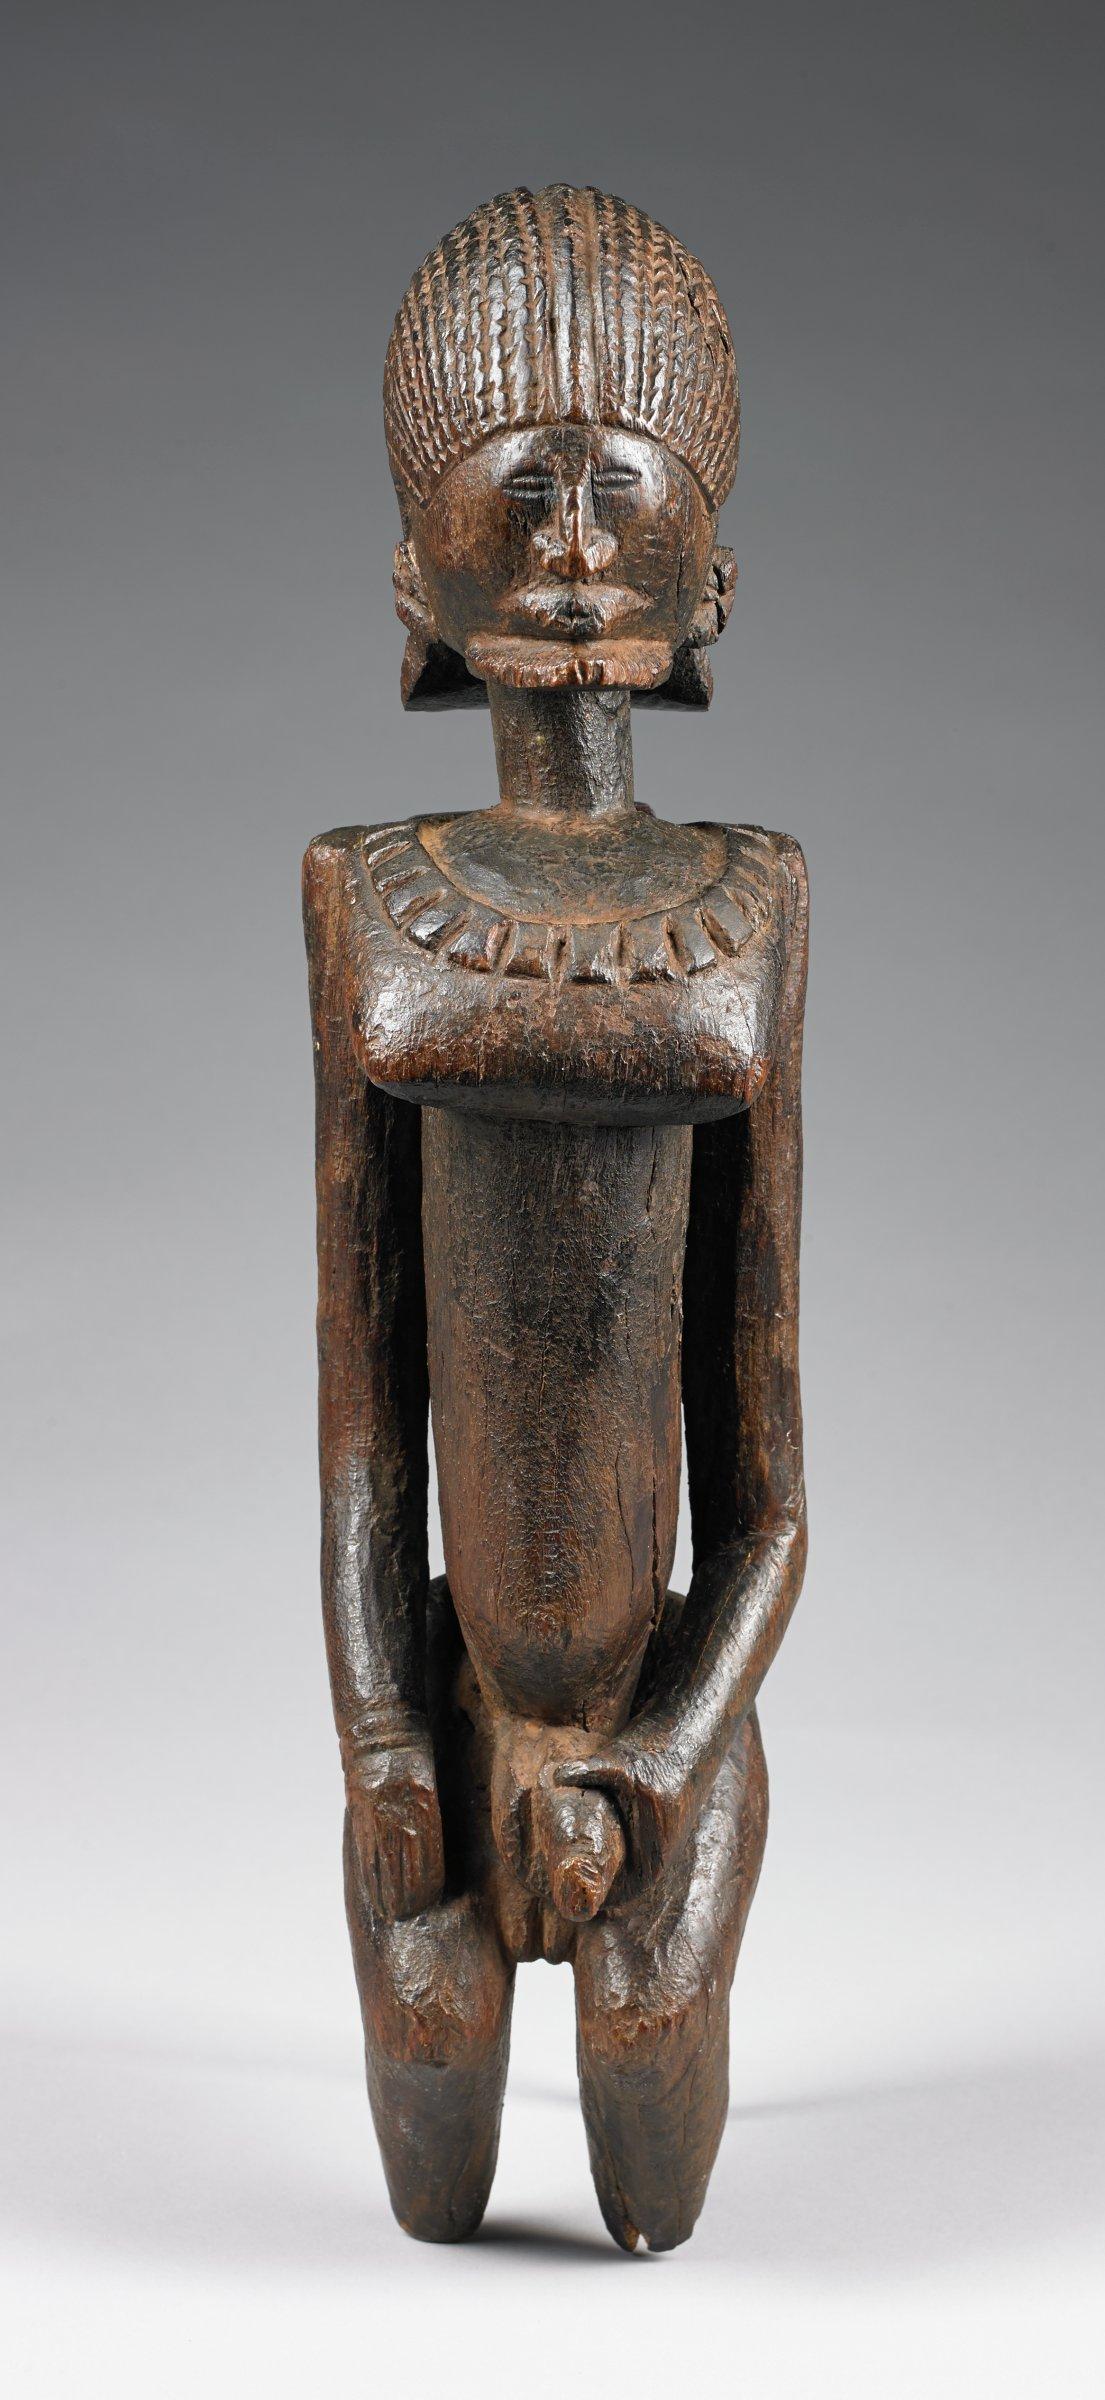 Mythical figure